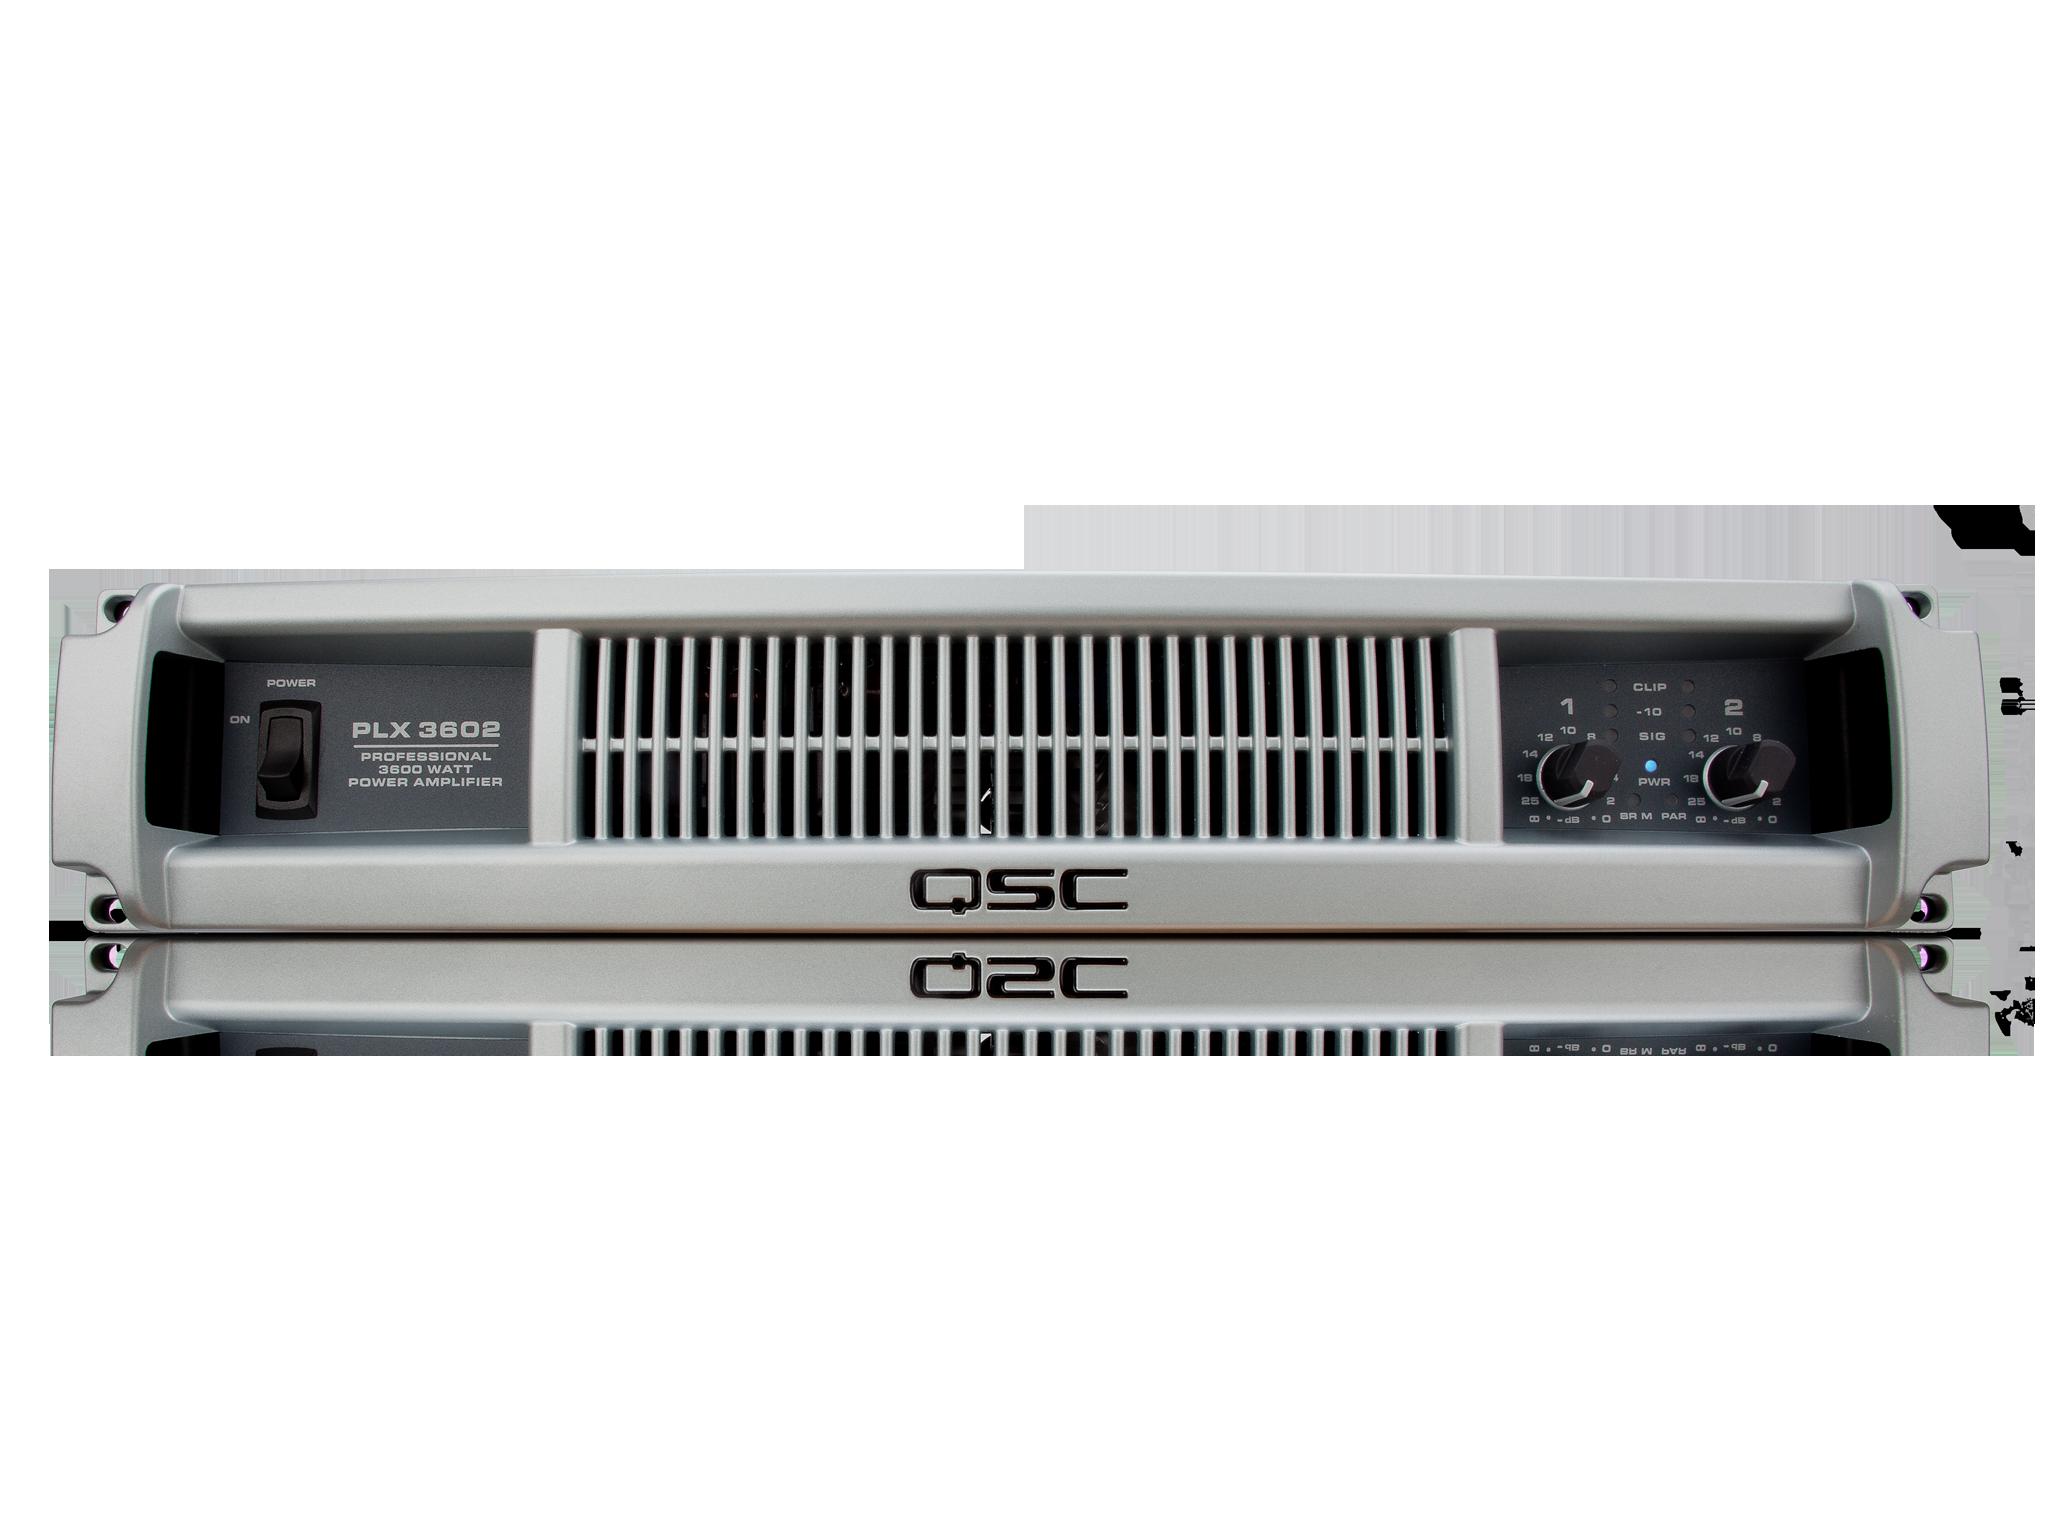 Plx3602 Power Amplifier Qsc 200 Watts Super Bridge Amplifiers Front